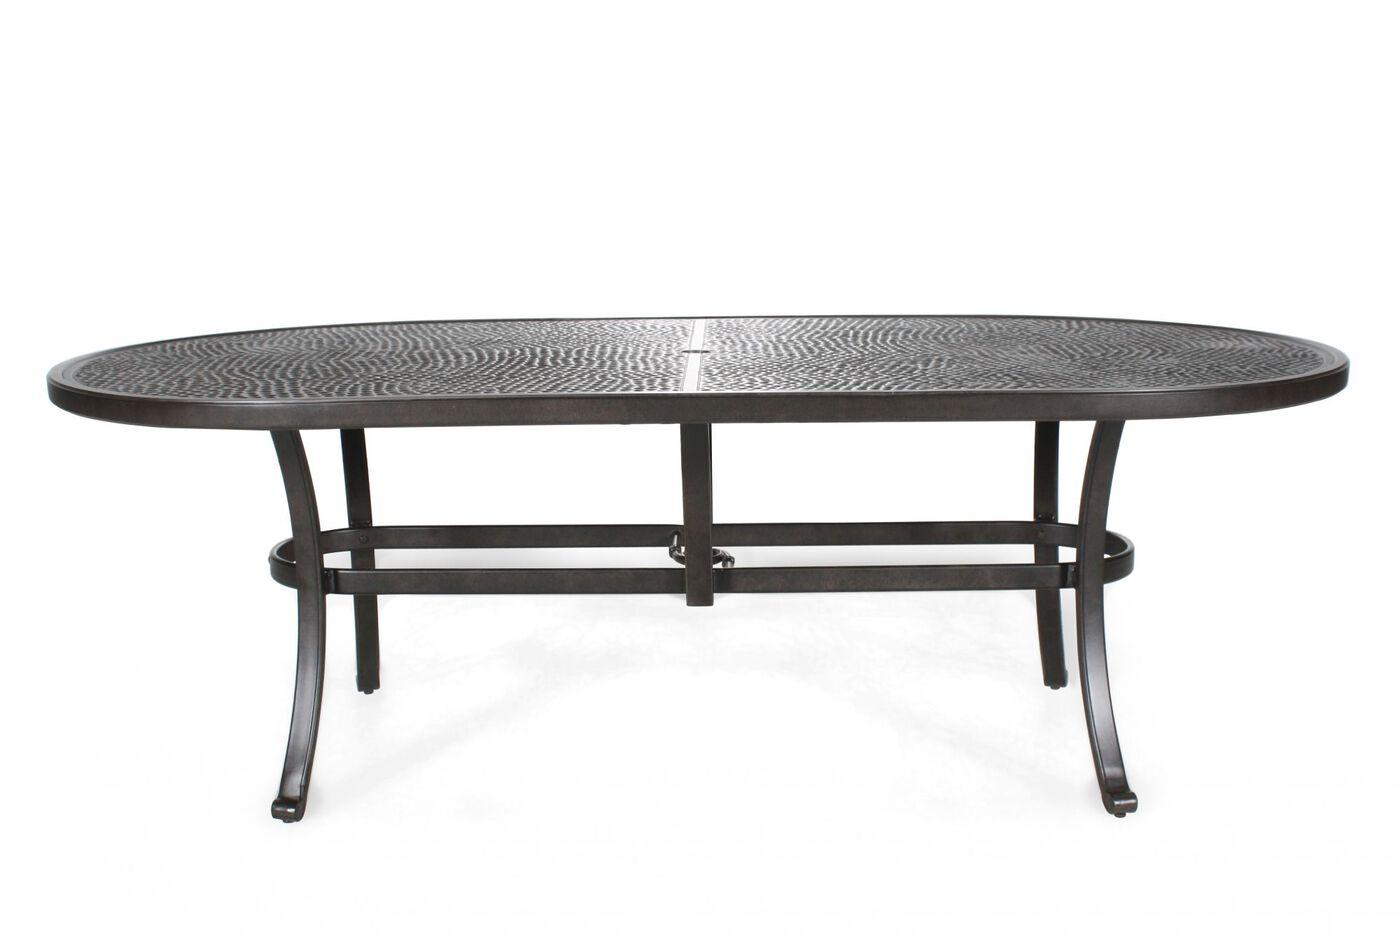 Marble Oval Dining Table Images Dining Table Ideas : PFB NOD84 from sorahana.info size 1400 x 933 jpeg 64kB